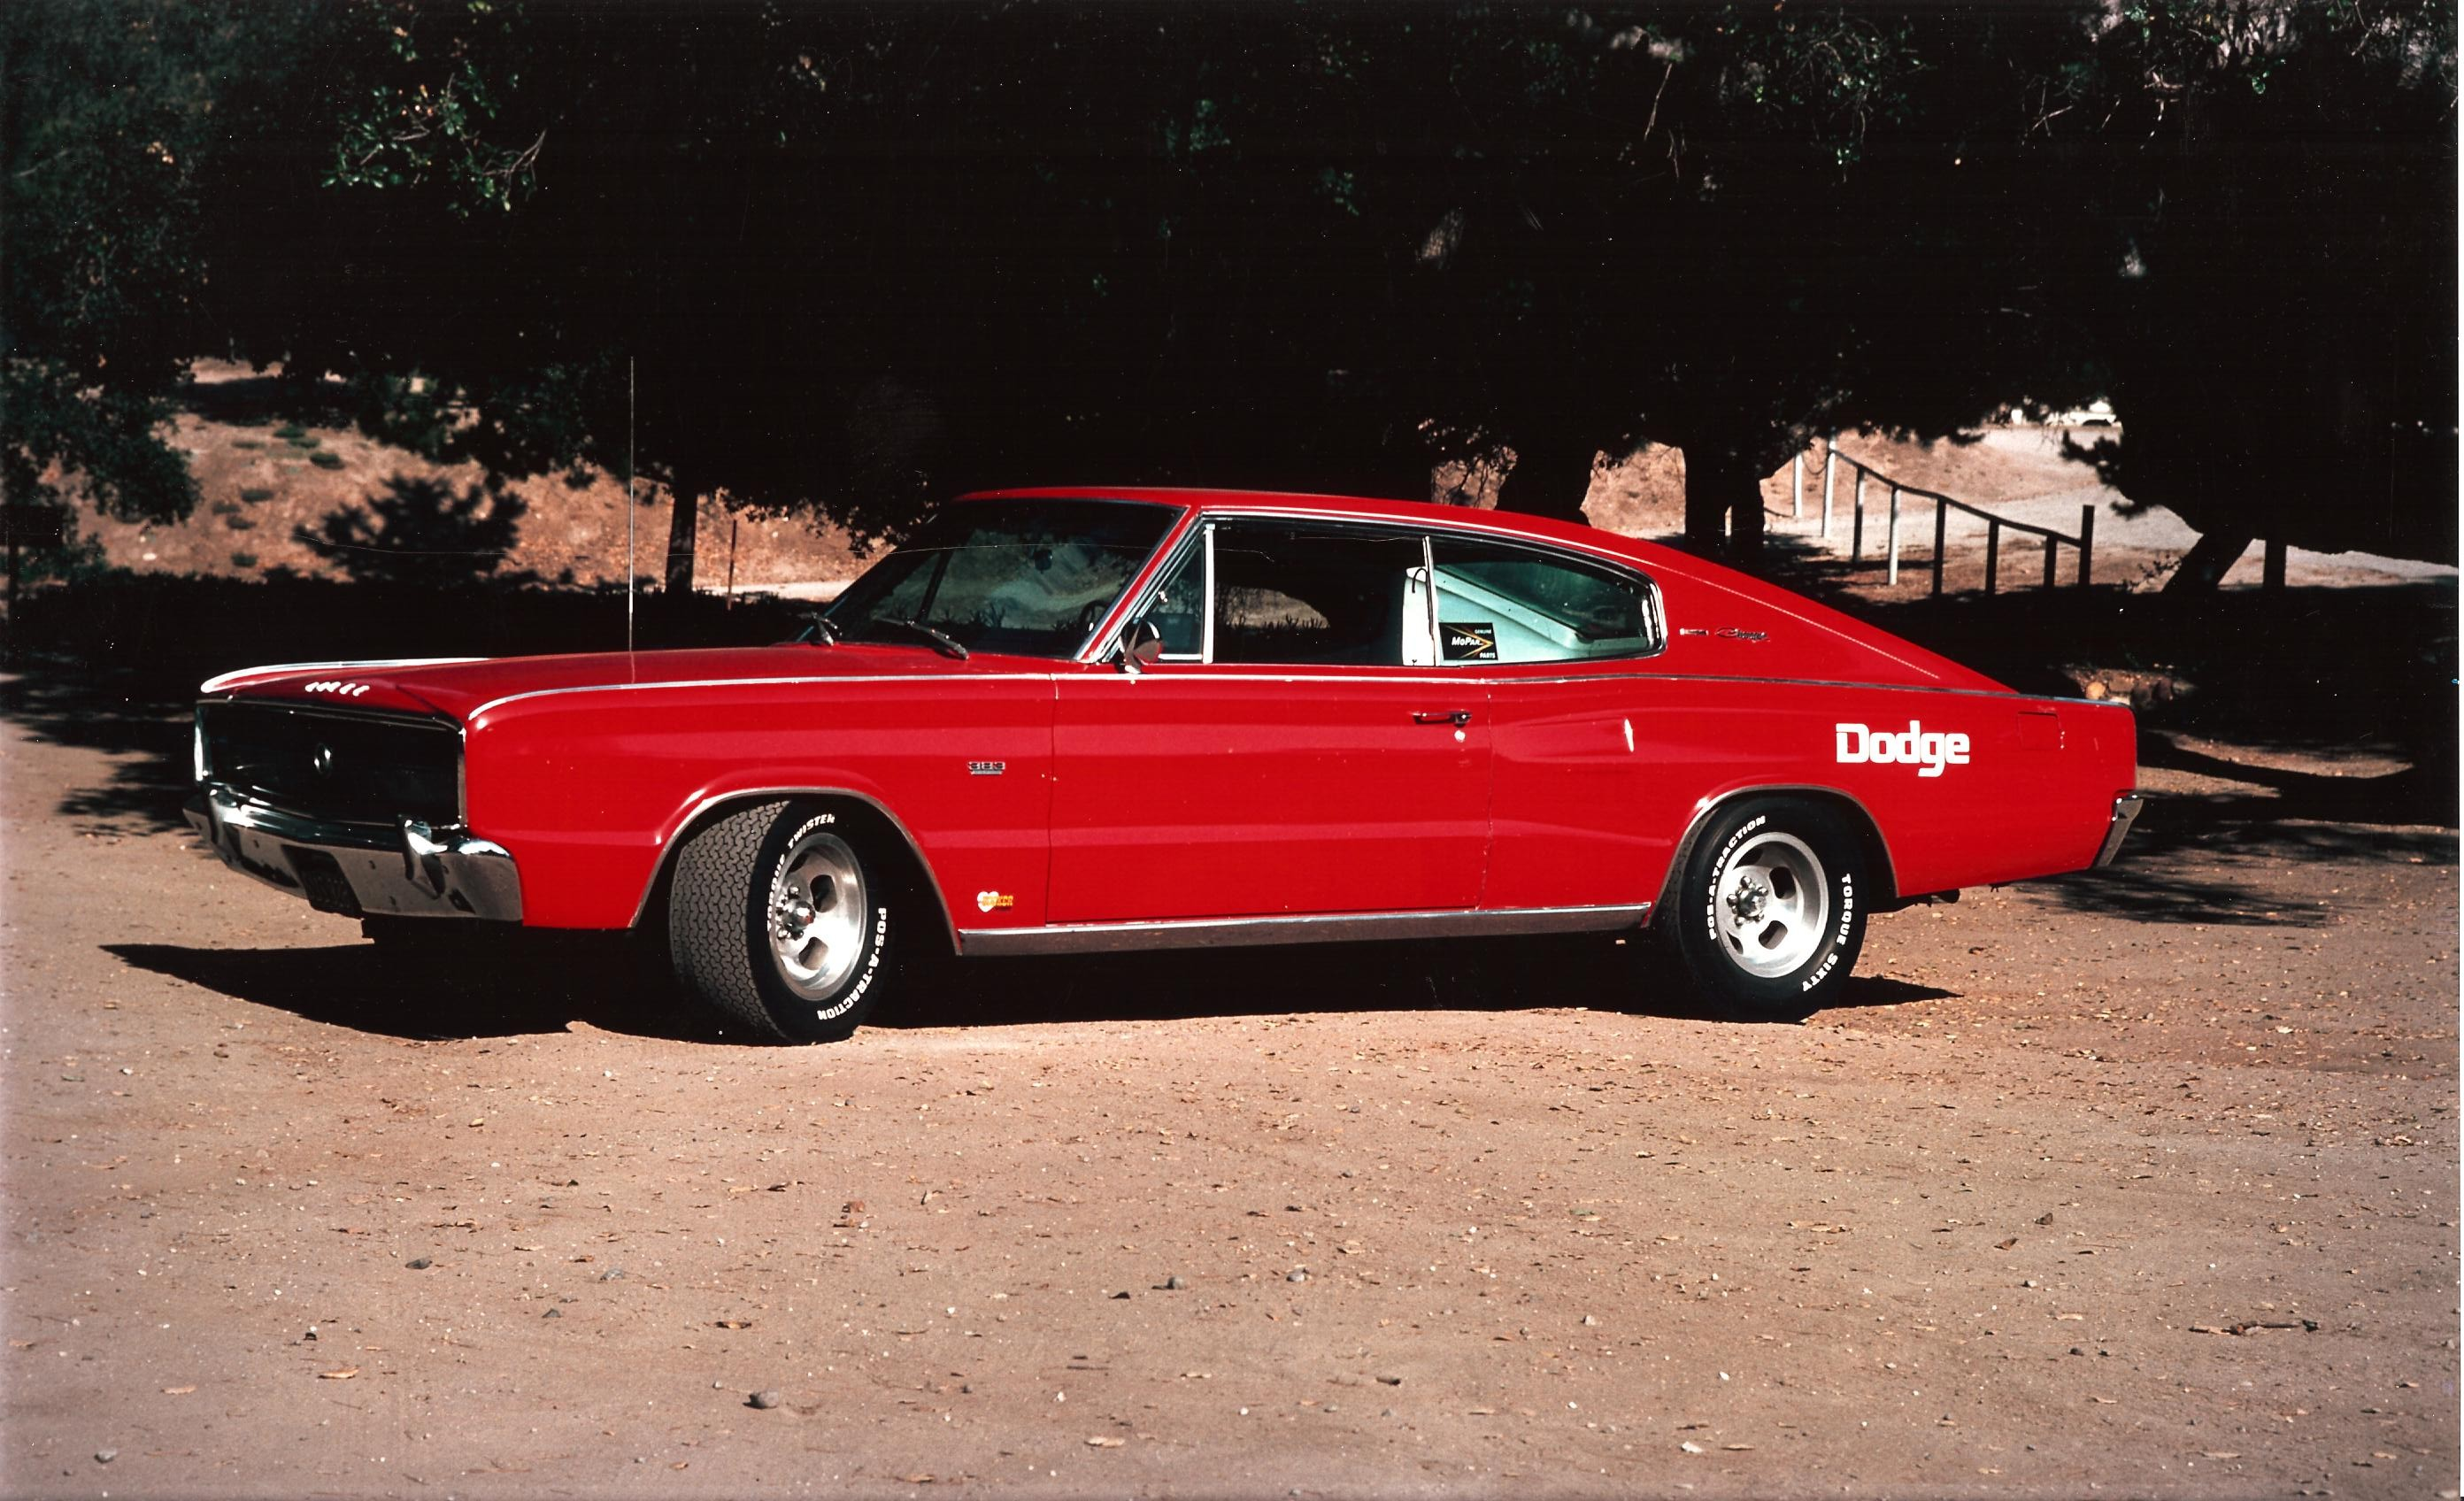 1966 Dodge Charger 2 Door Fastback 1 4 Mile Drag Racing